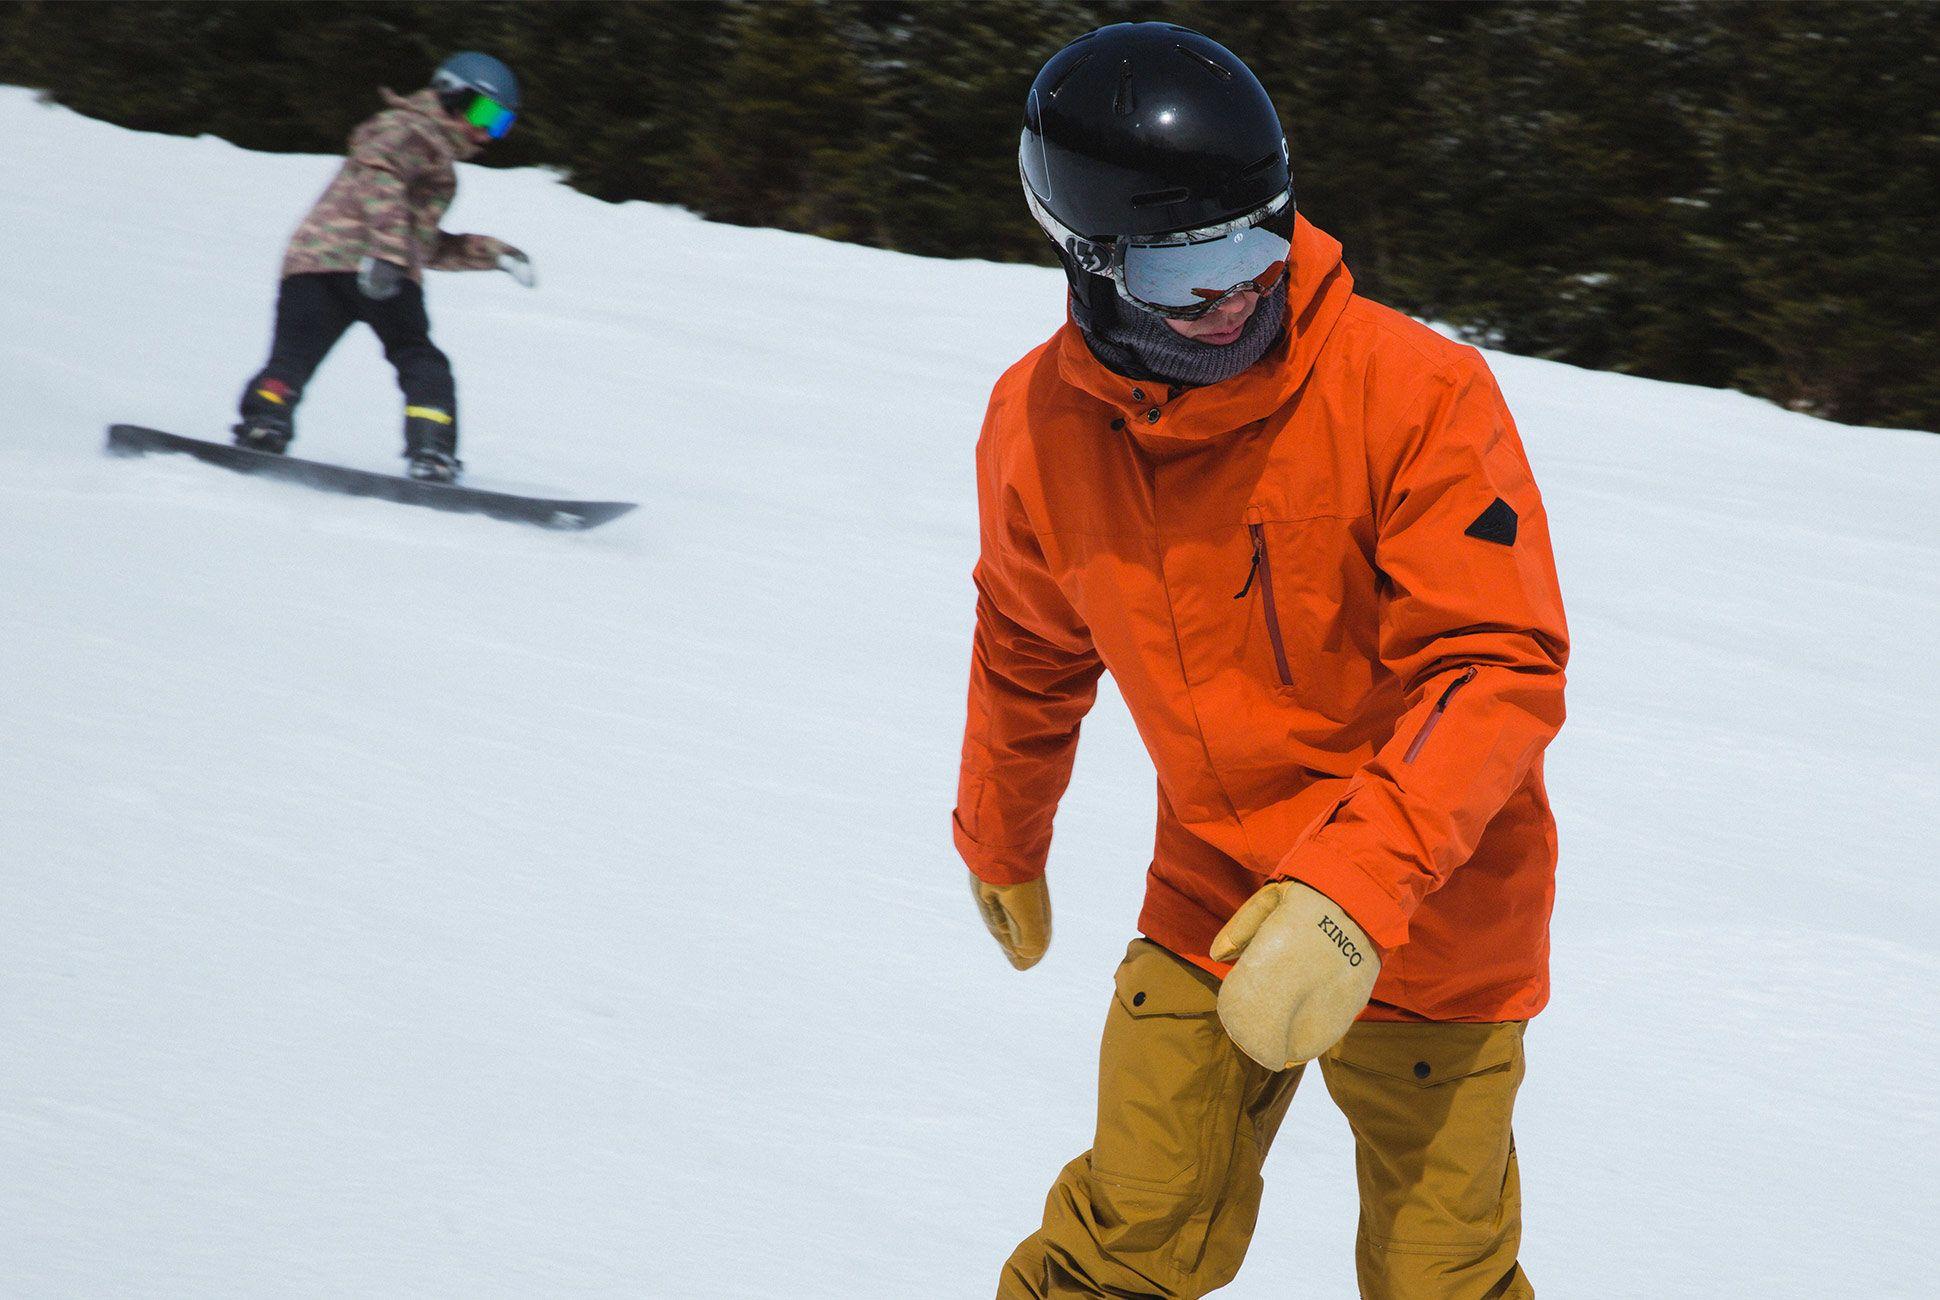 ultimate-ski-and-snow-gear-patrol-dakine-slide-3